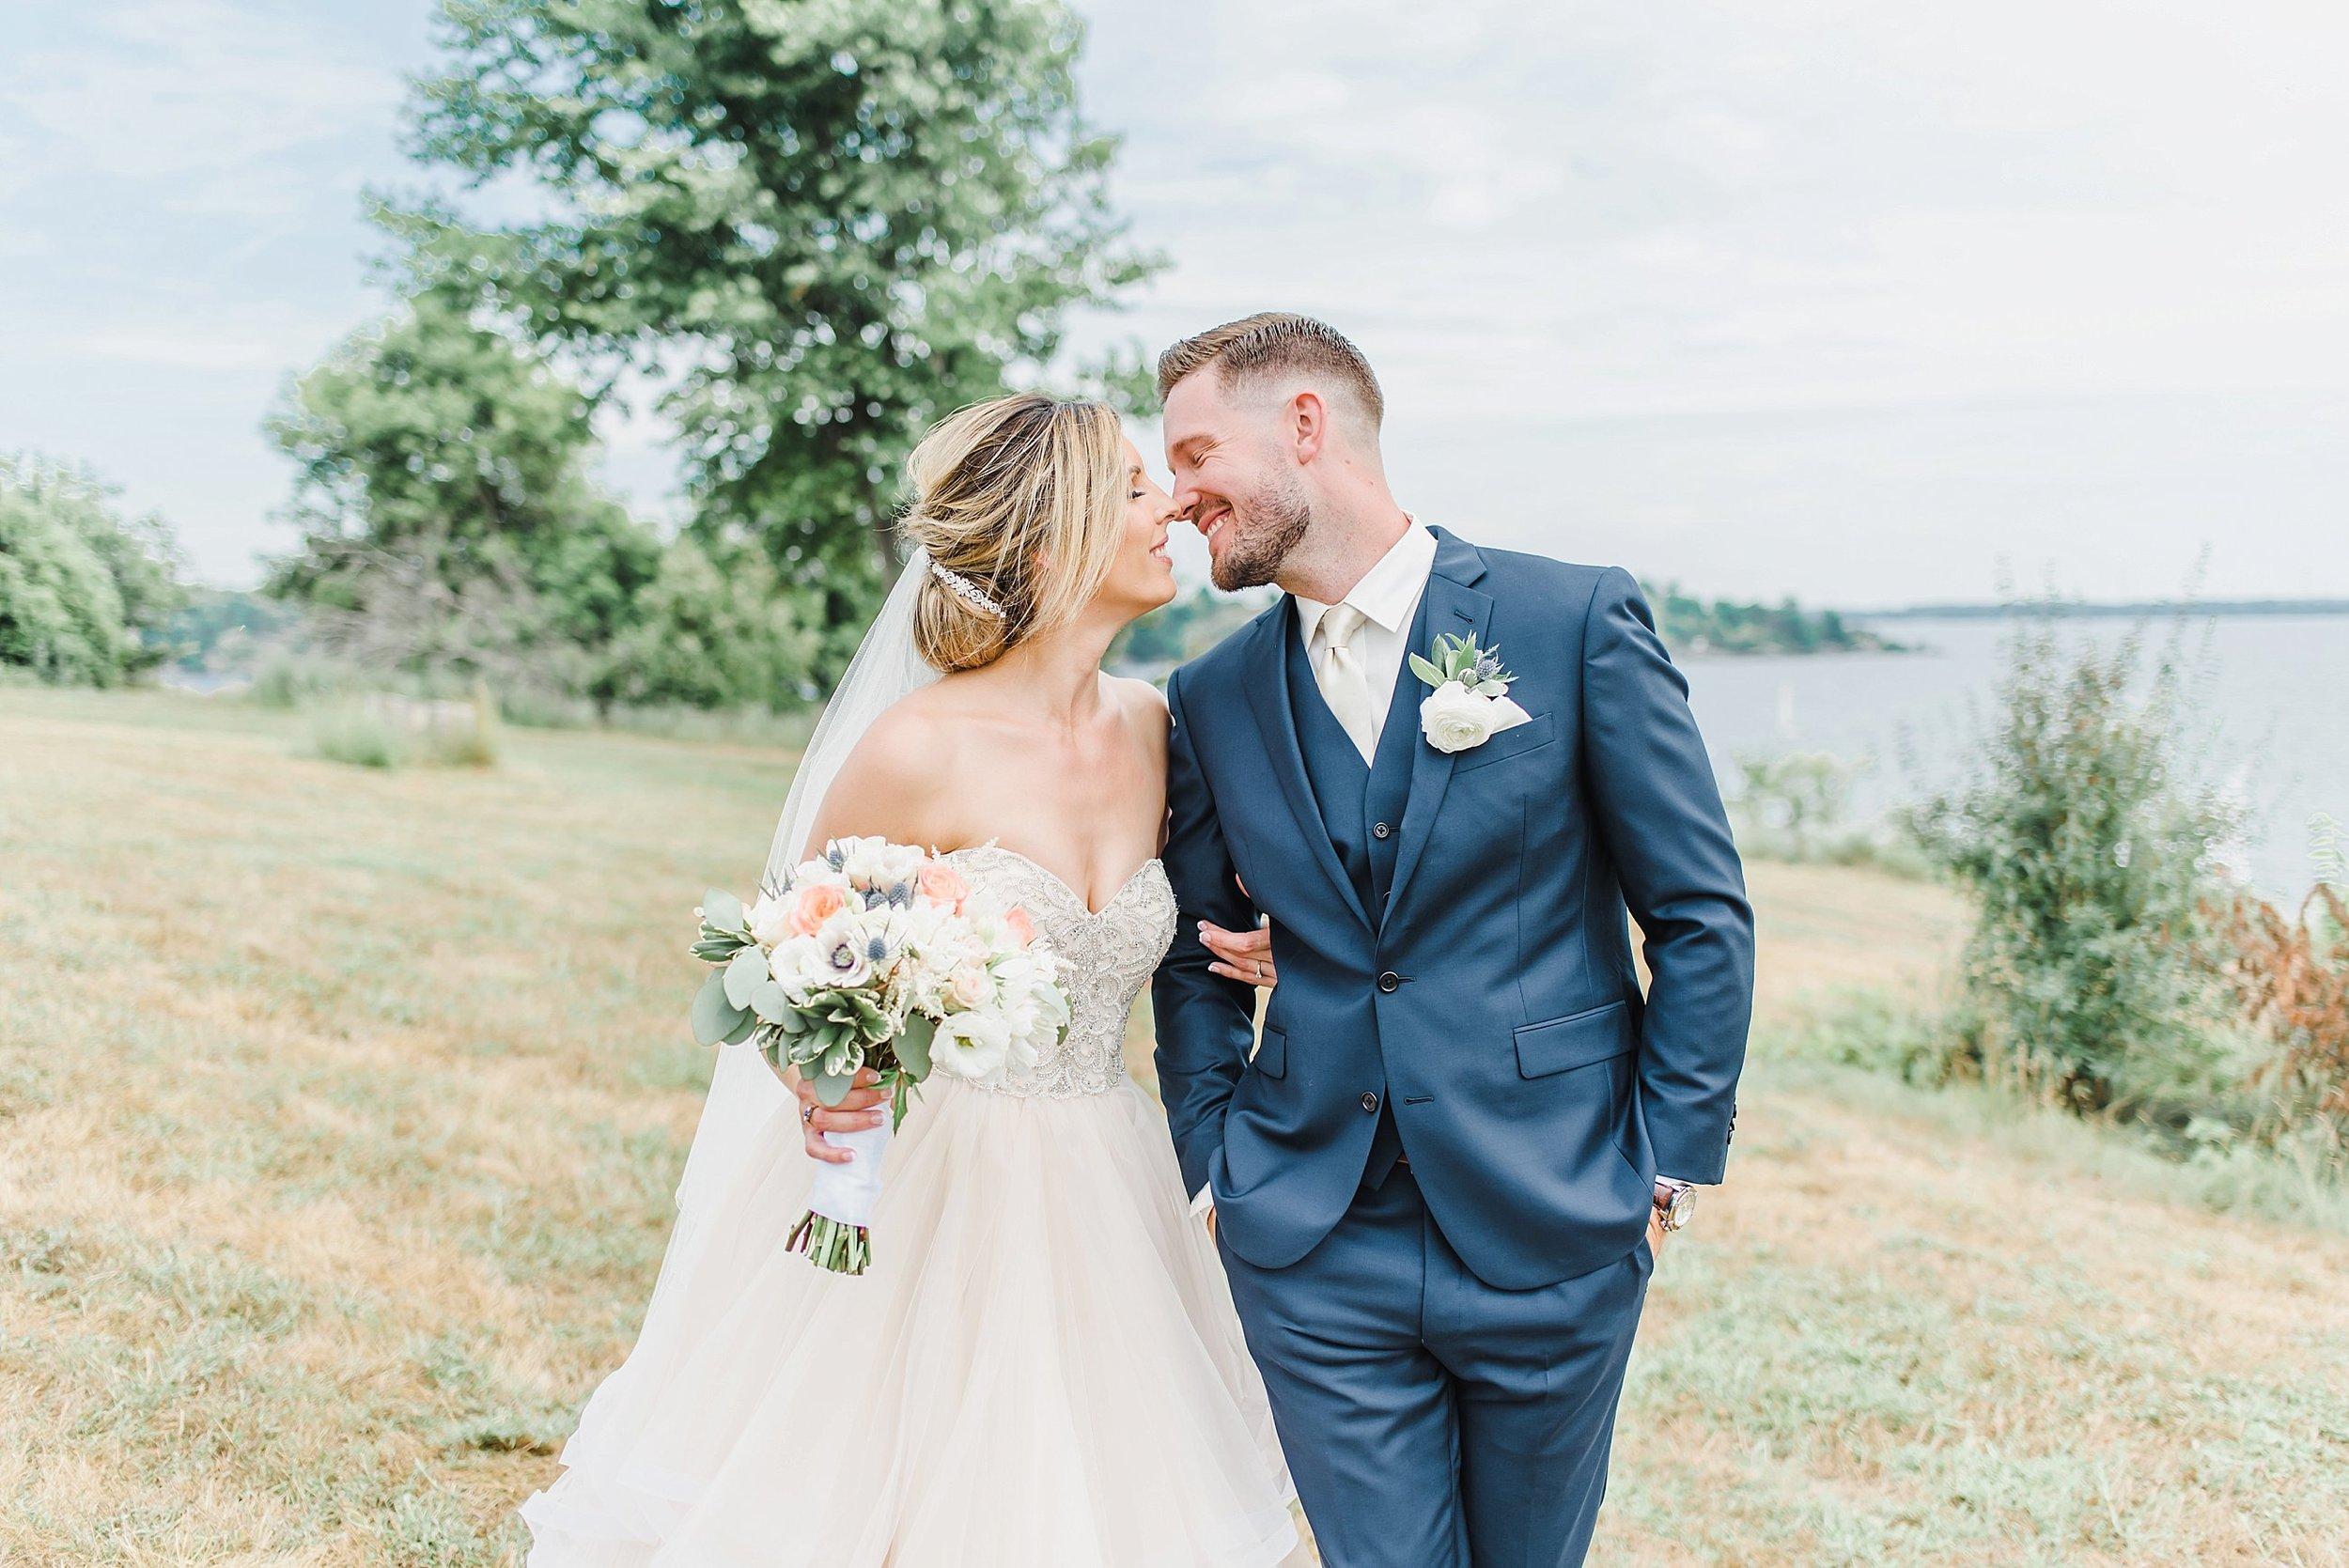 light airy indie fine art ottawa wedding photographer | Ali and Batoul Photography_0167.jpg